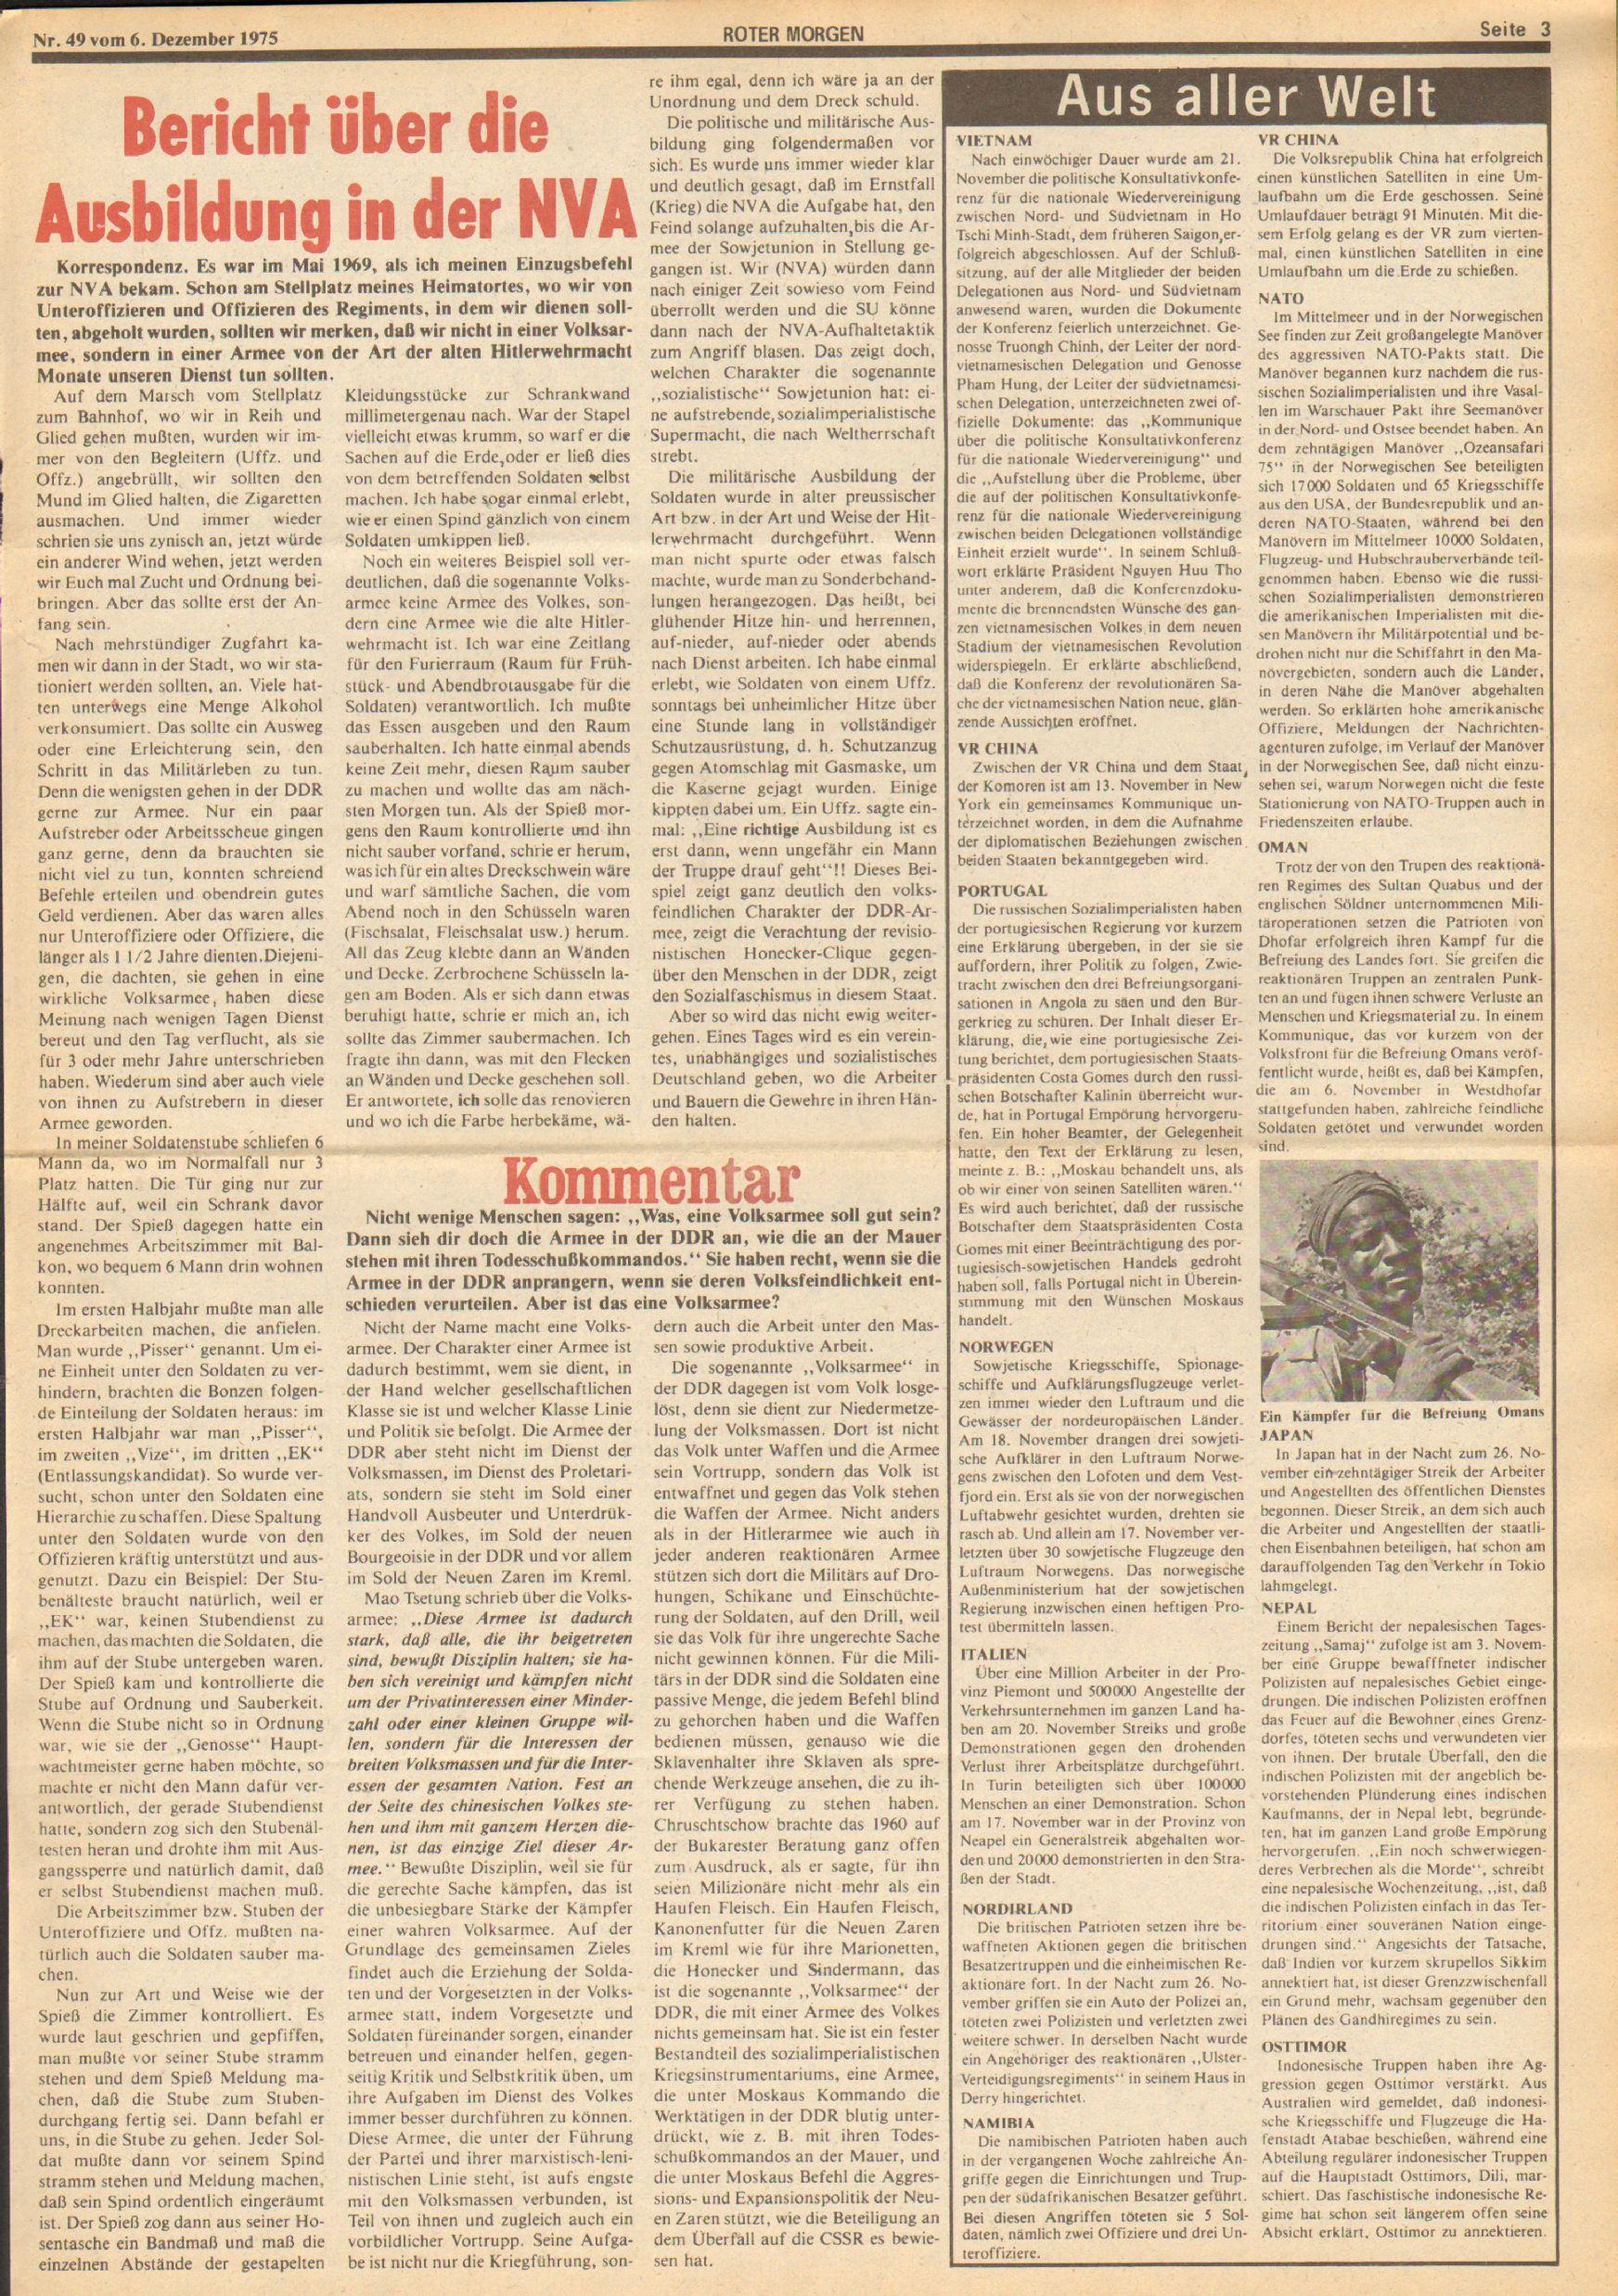 Roter Morgen, 9. Jg., 6. Dezember 1975, Nr. 49, Seite 3